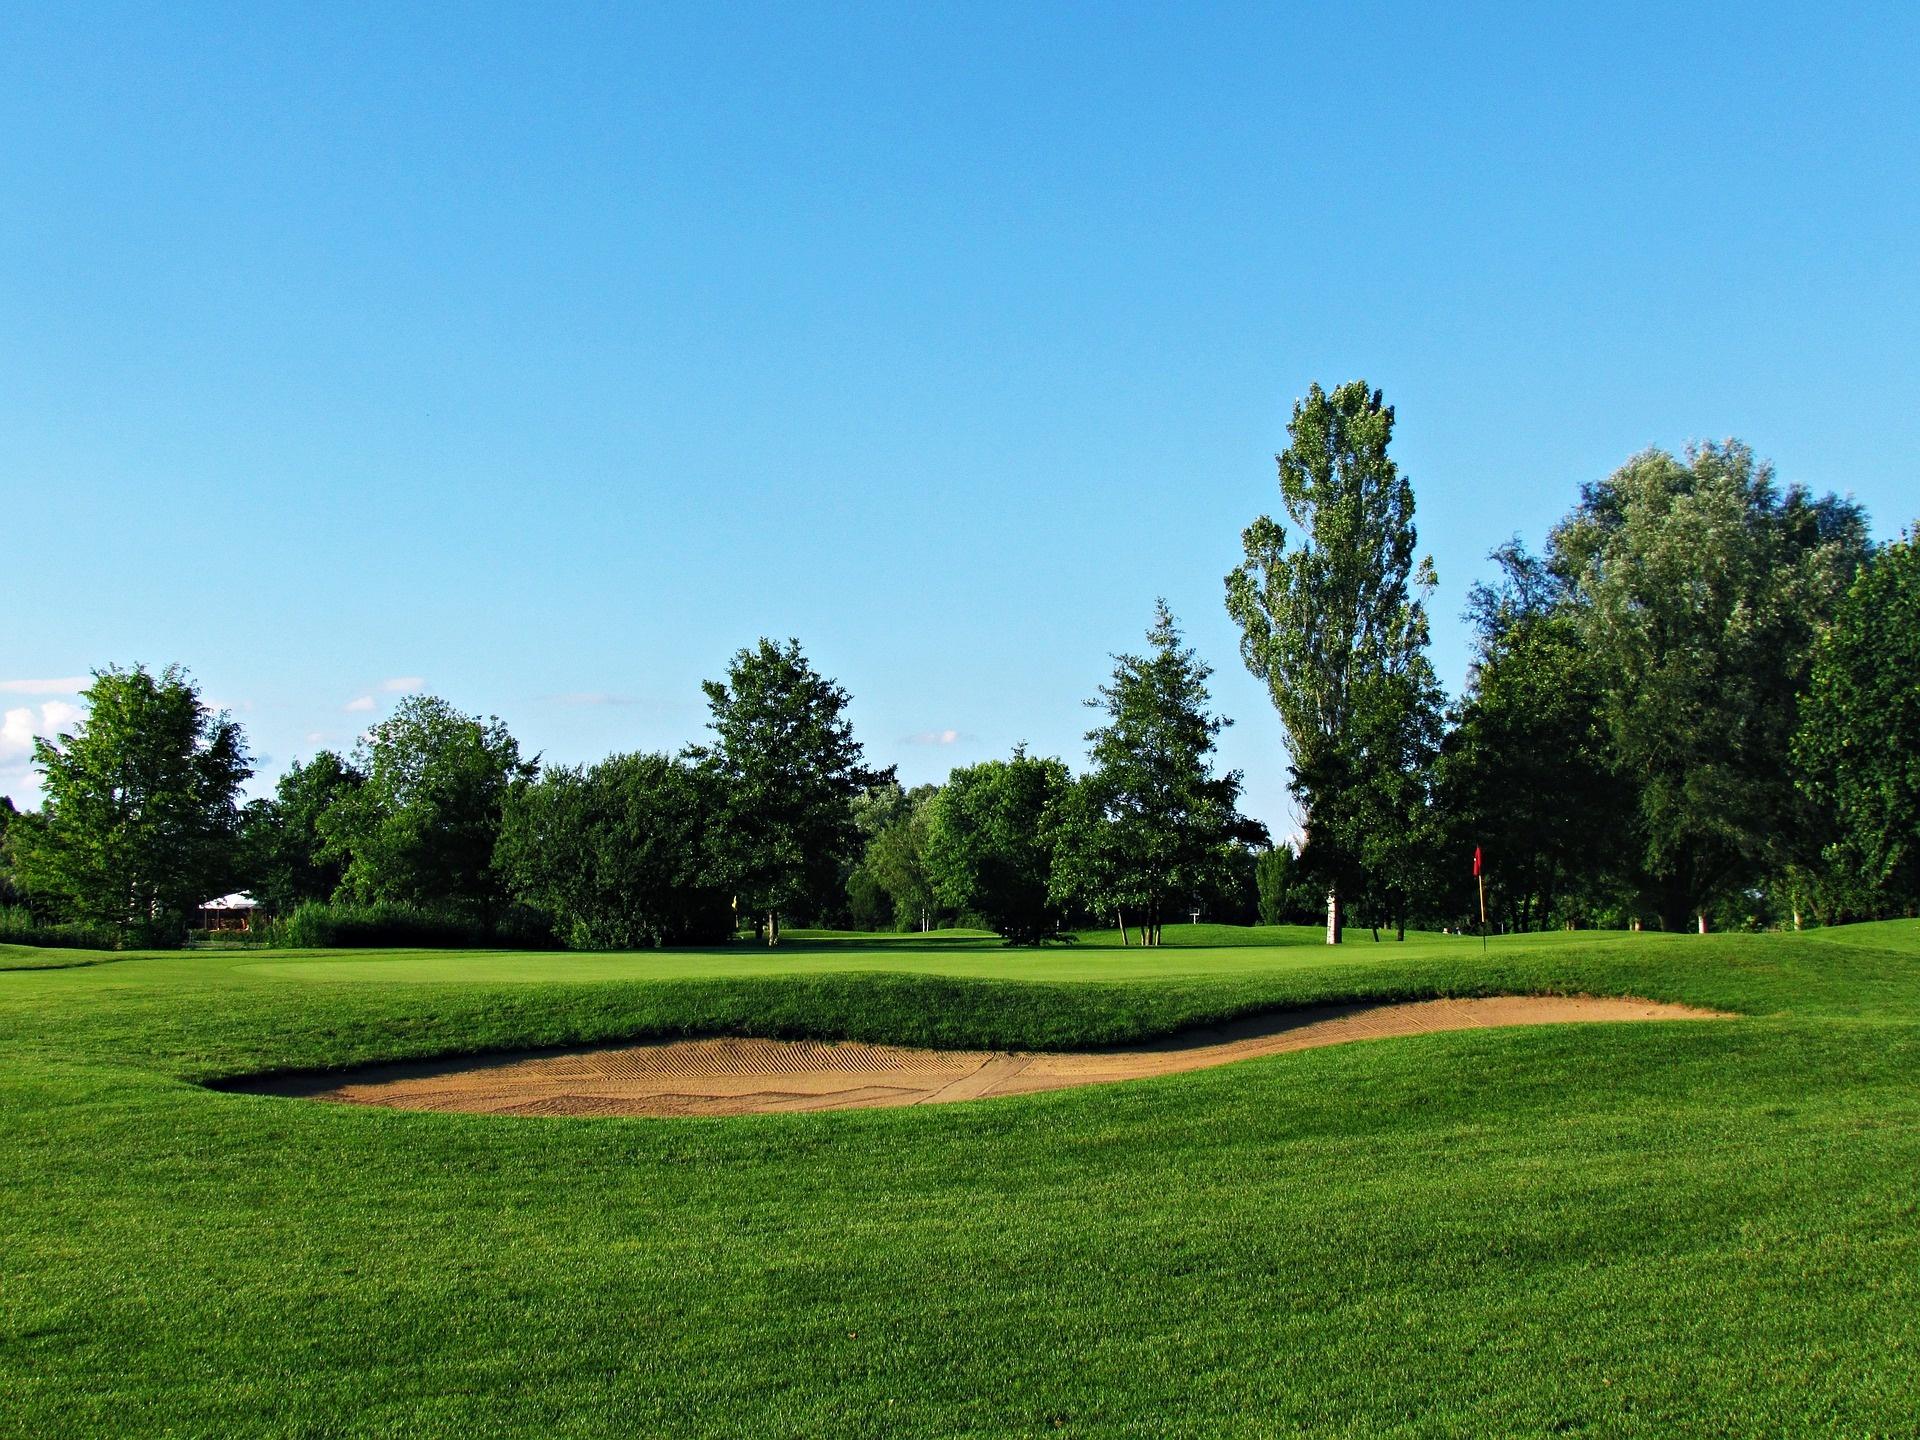 Golf course generic image_1534756233325.jpg